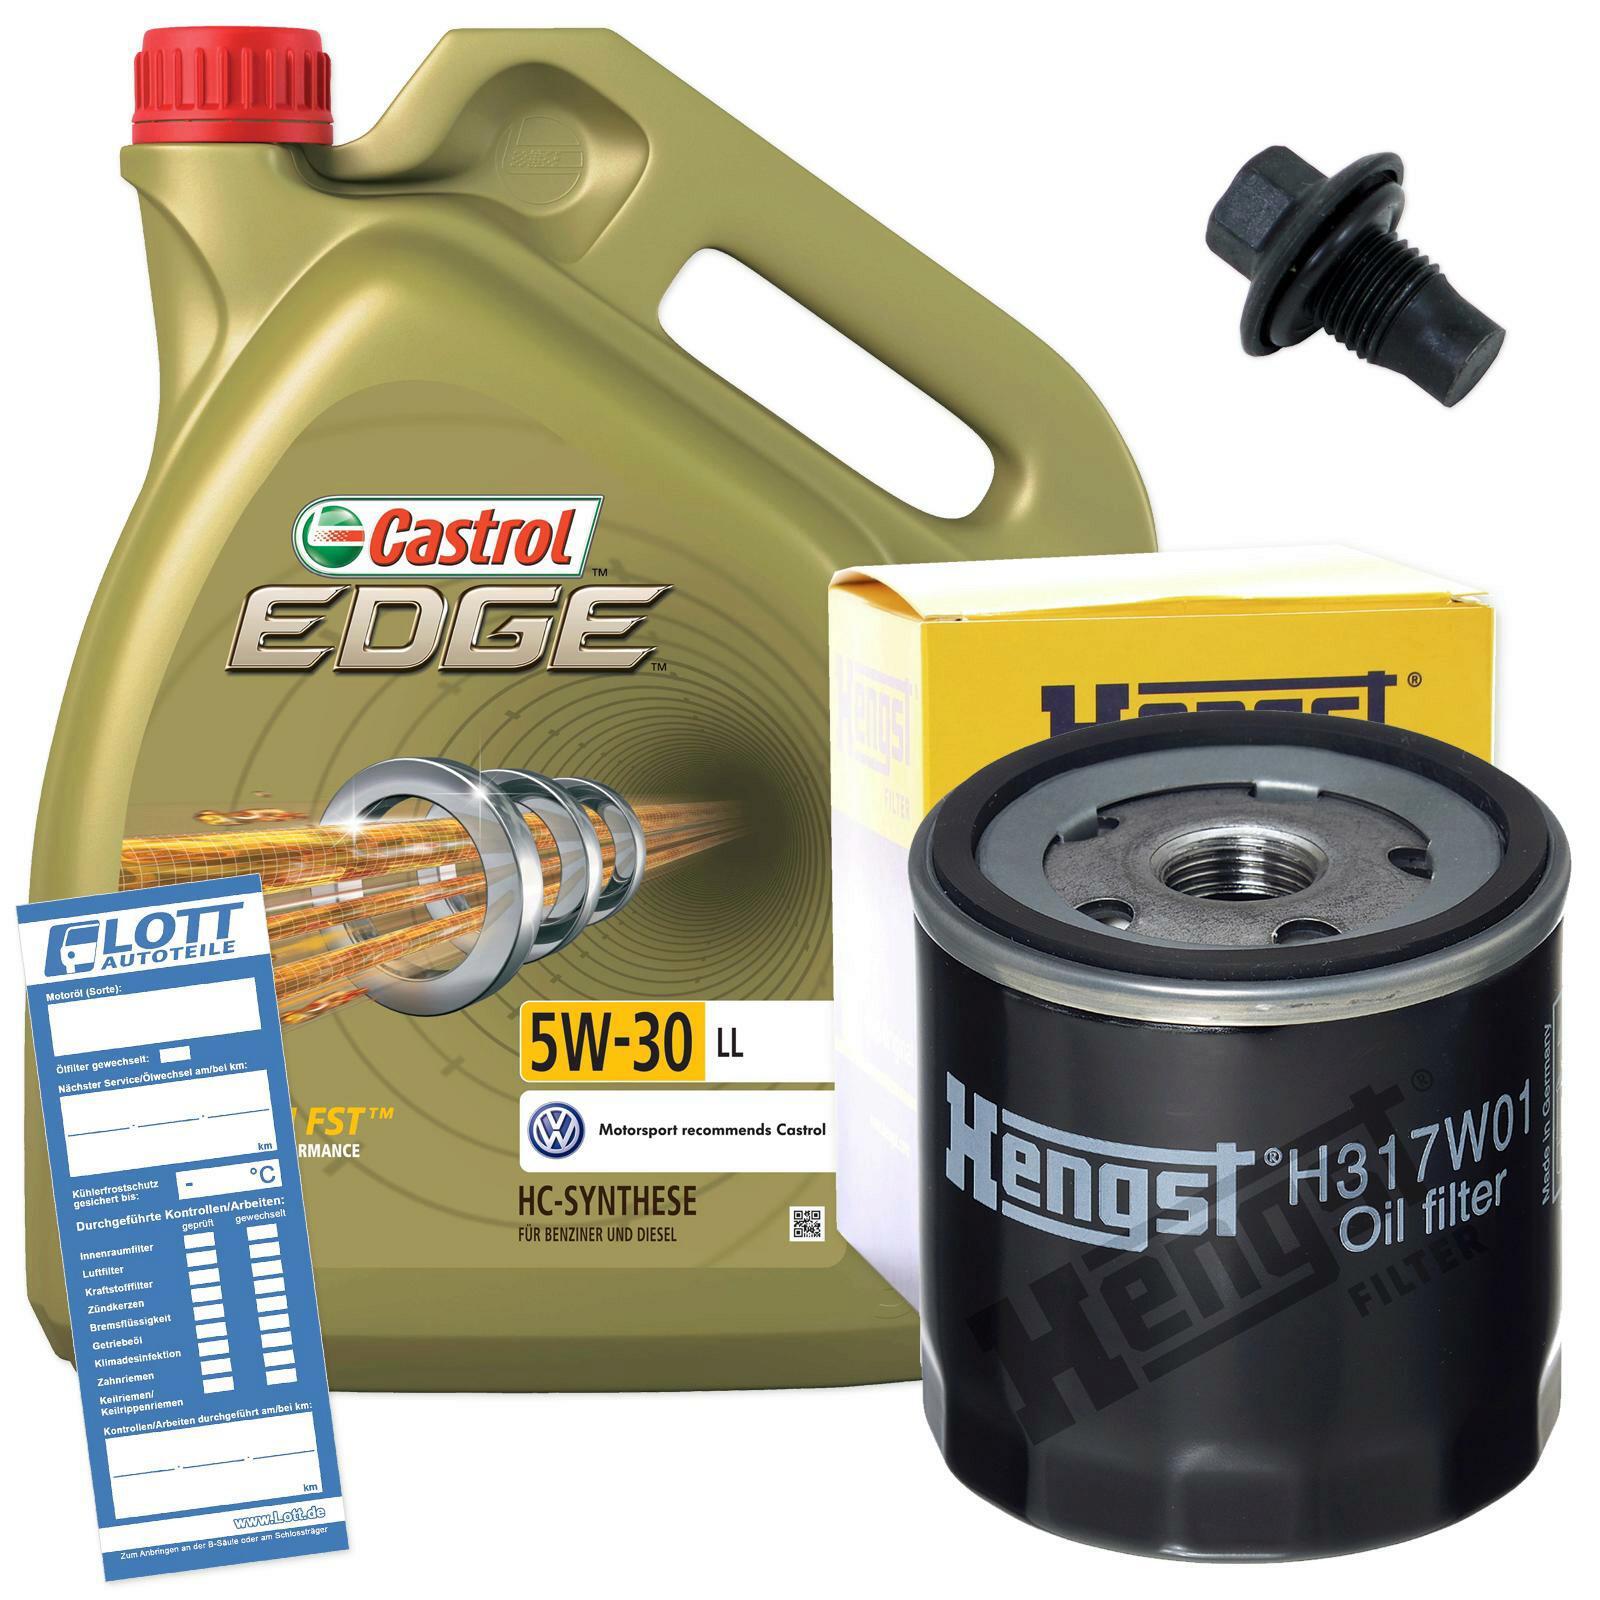 Ölwechsel Set Castrol Motoröl + Hengst Ölfilter + Ablassschraube